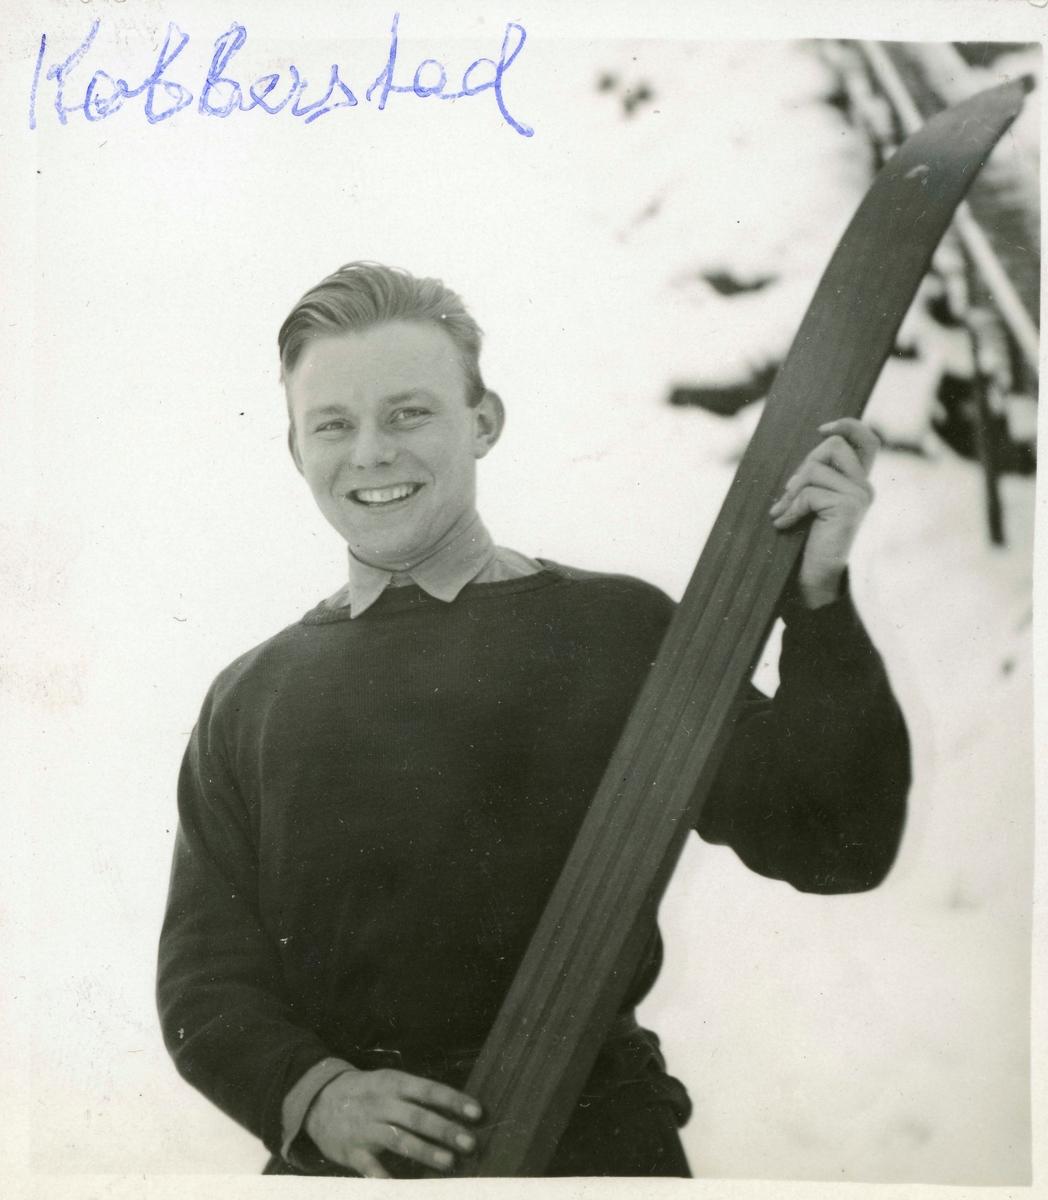 Athlete Kobberstad